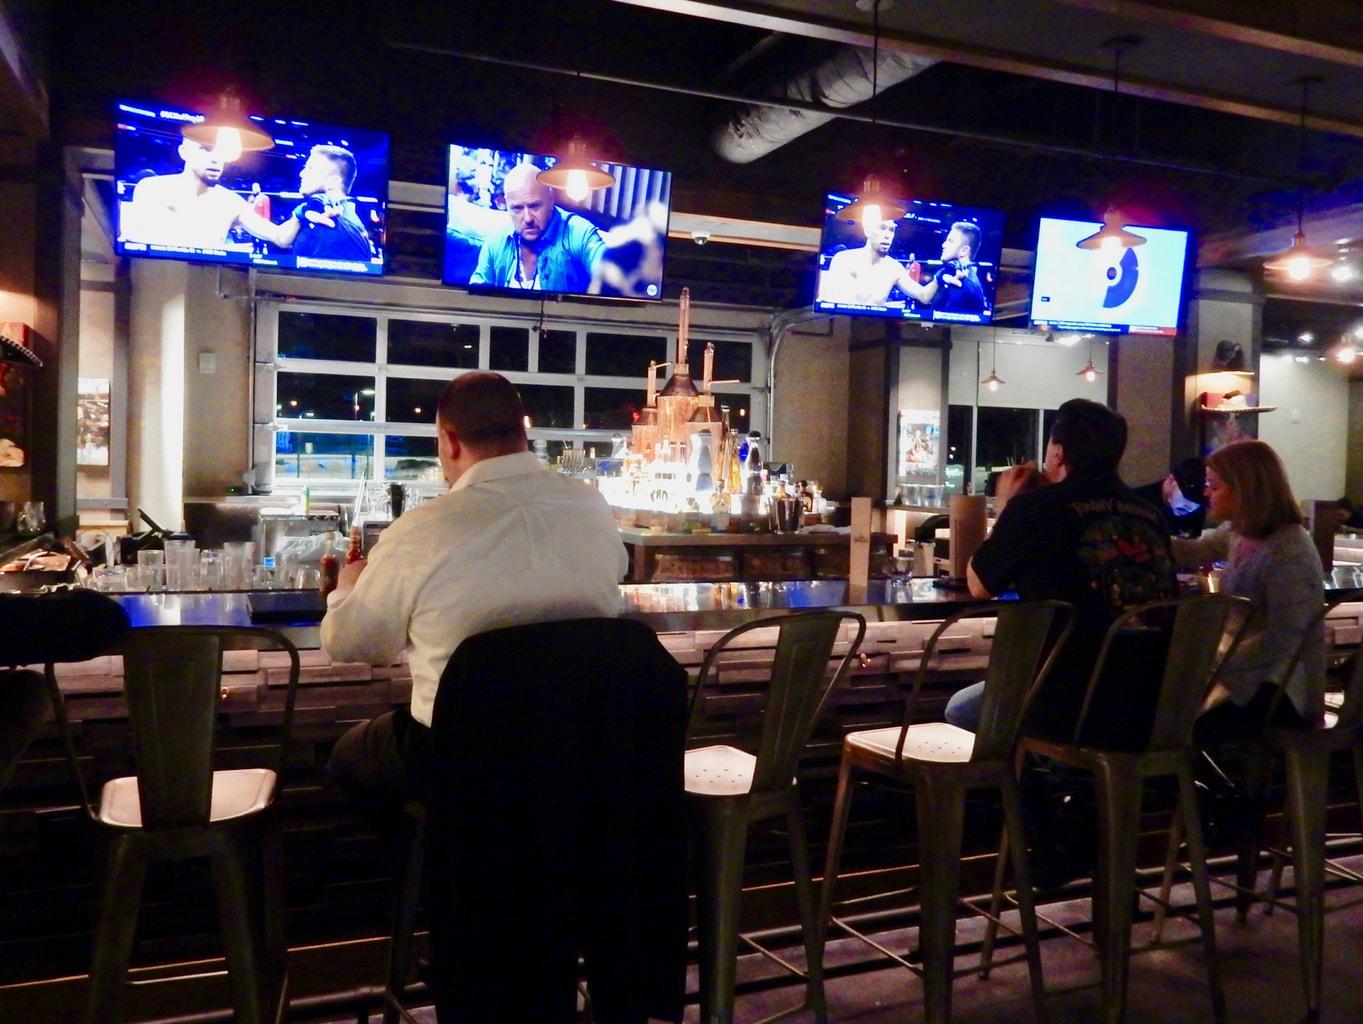 Monticello Motor Club >> Resorts World Catskills, Monticello NY: Betting, Off ...